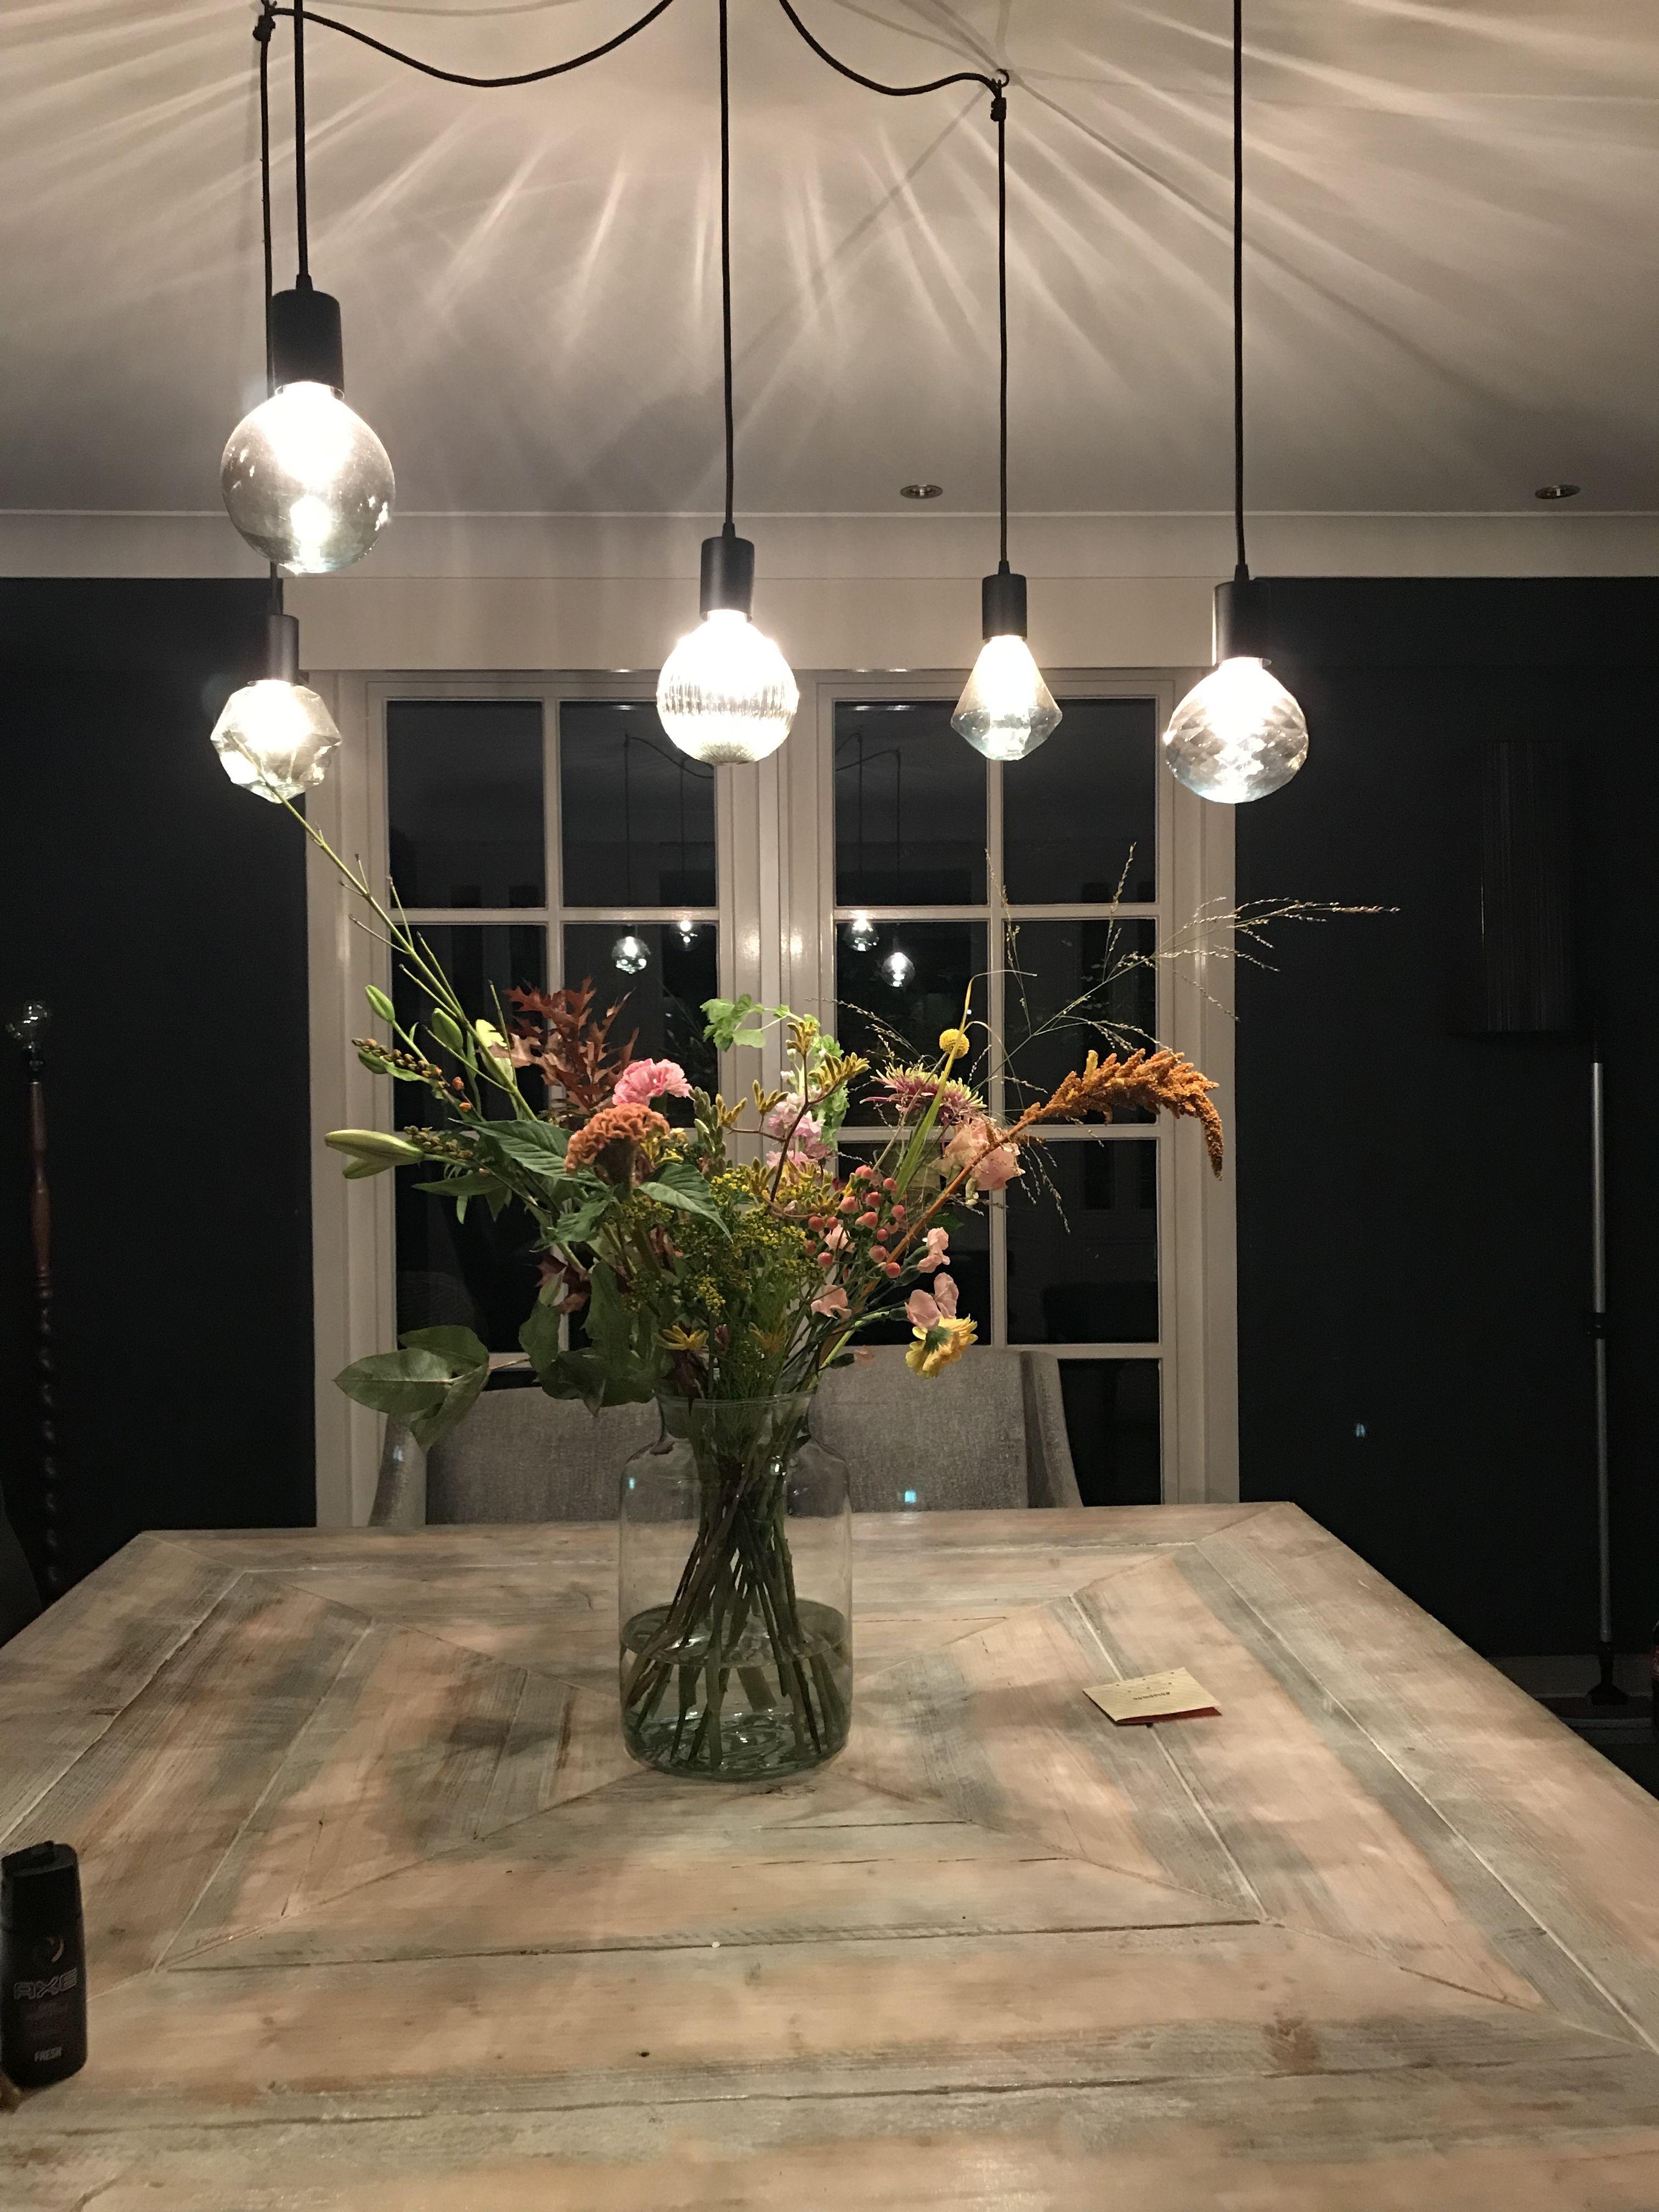 Yinka Antique Glass Pendant Lights Chandelier Ceiling Fixture IL